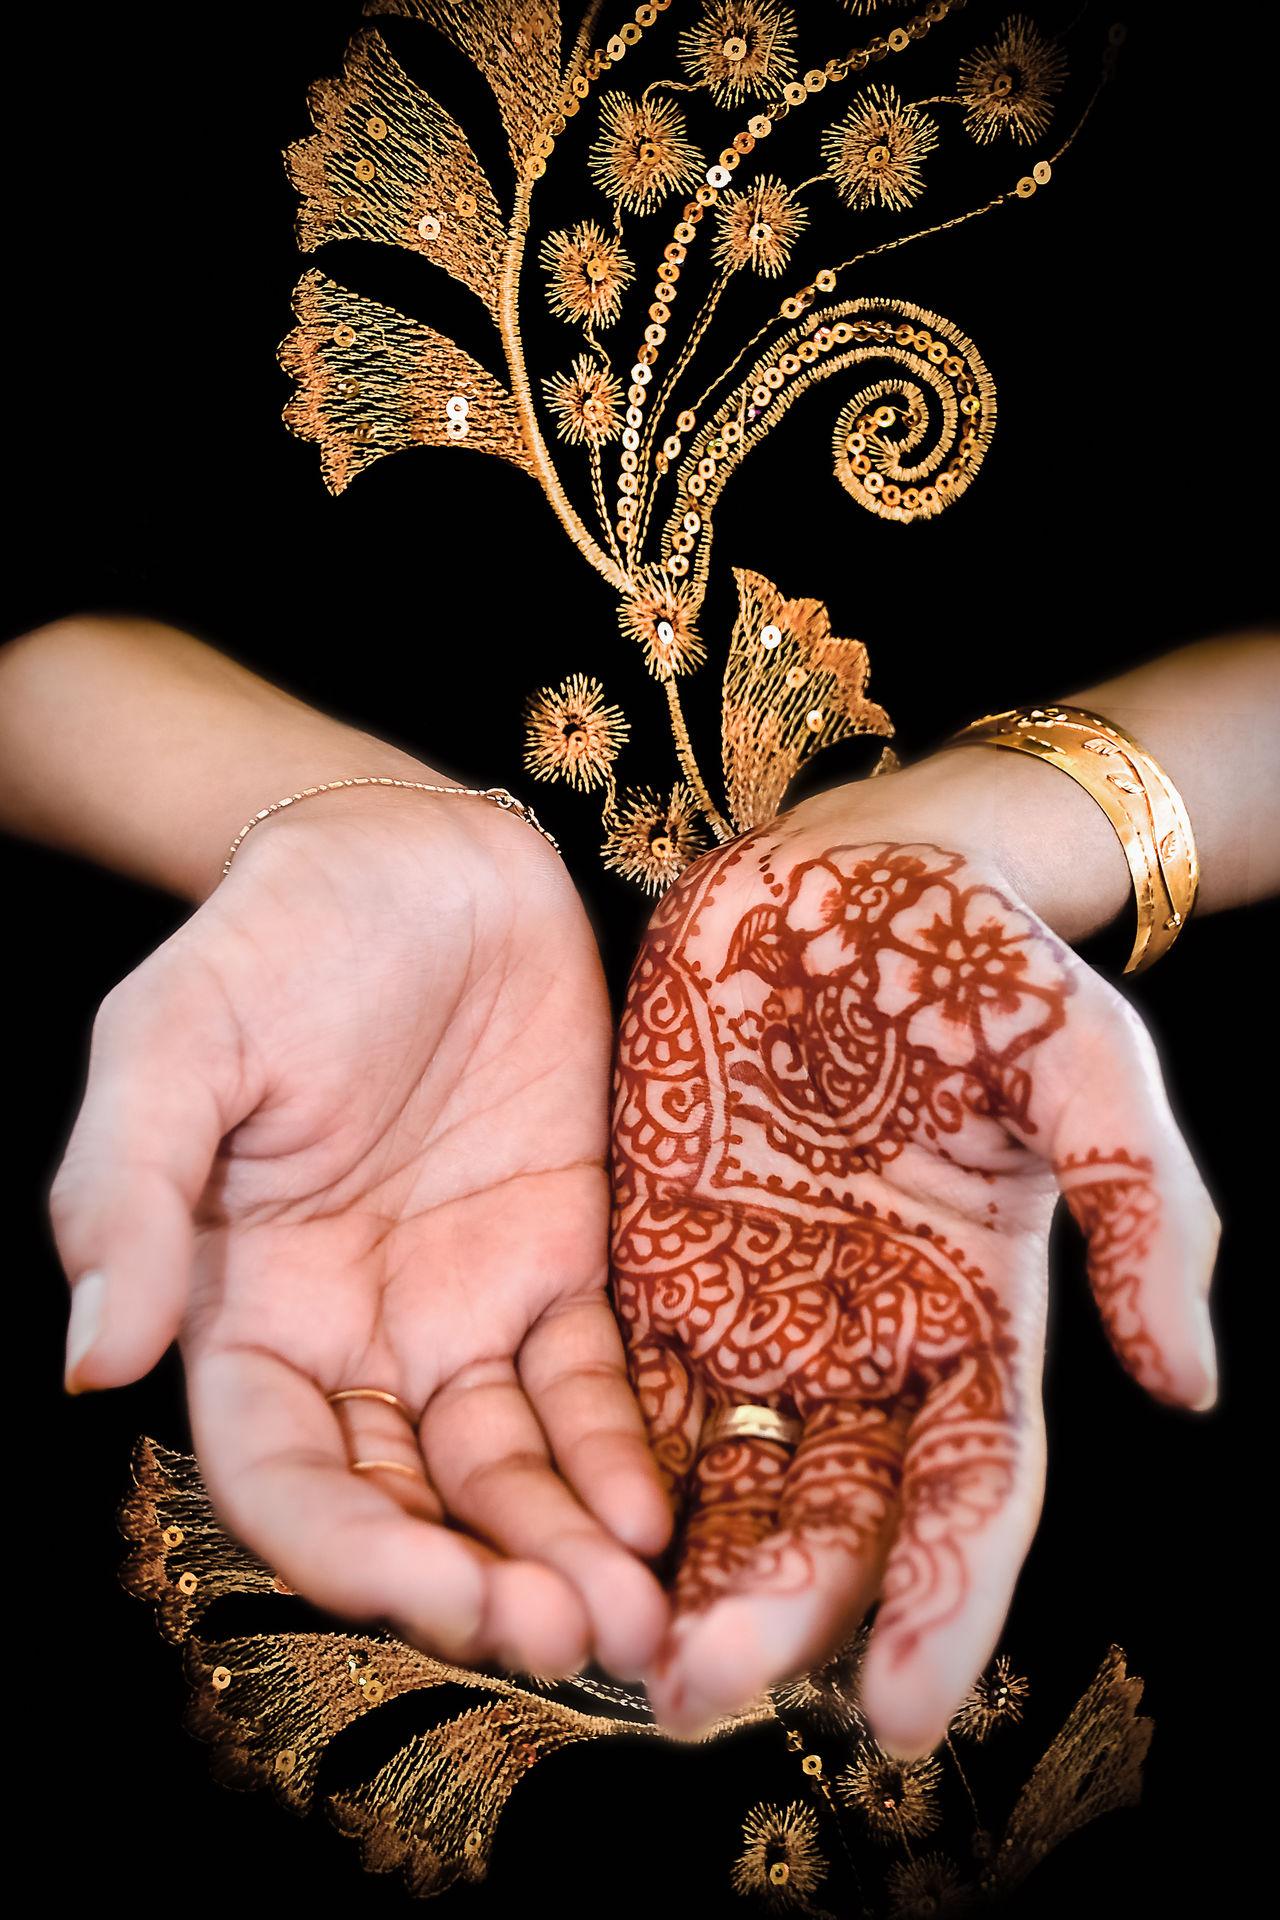 Art Black Close-up Colour Culture Dark Design Floral Fun Golden Henna Henna Art Henna Design Henna Tattoo Henna Tattoo ❤ Indian Muslim Outdoors Palm Prayer Praying Red Tattoo Traditional Woman